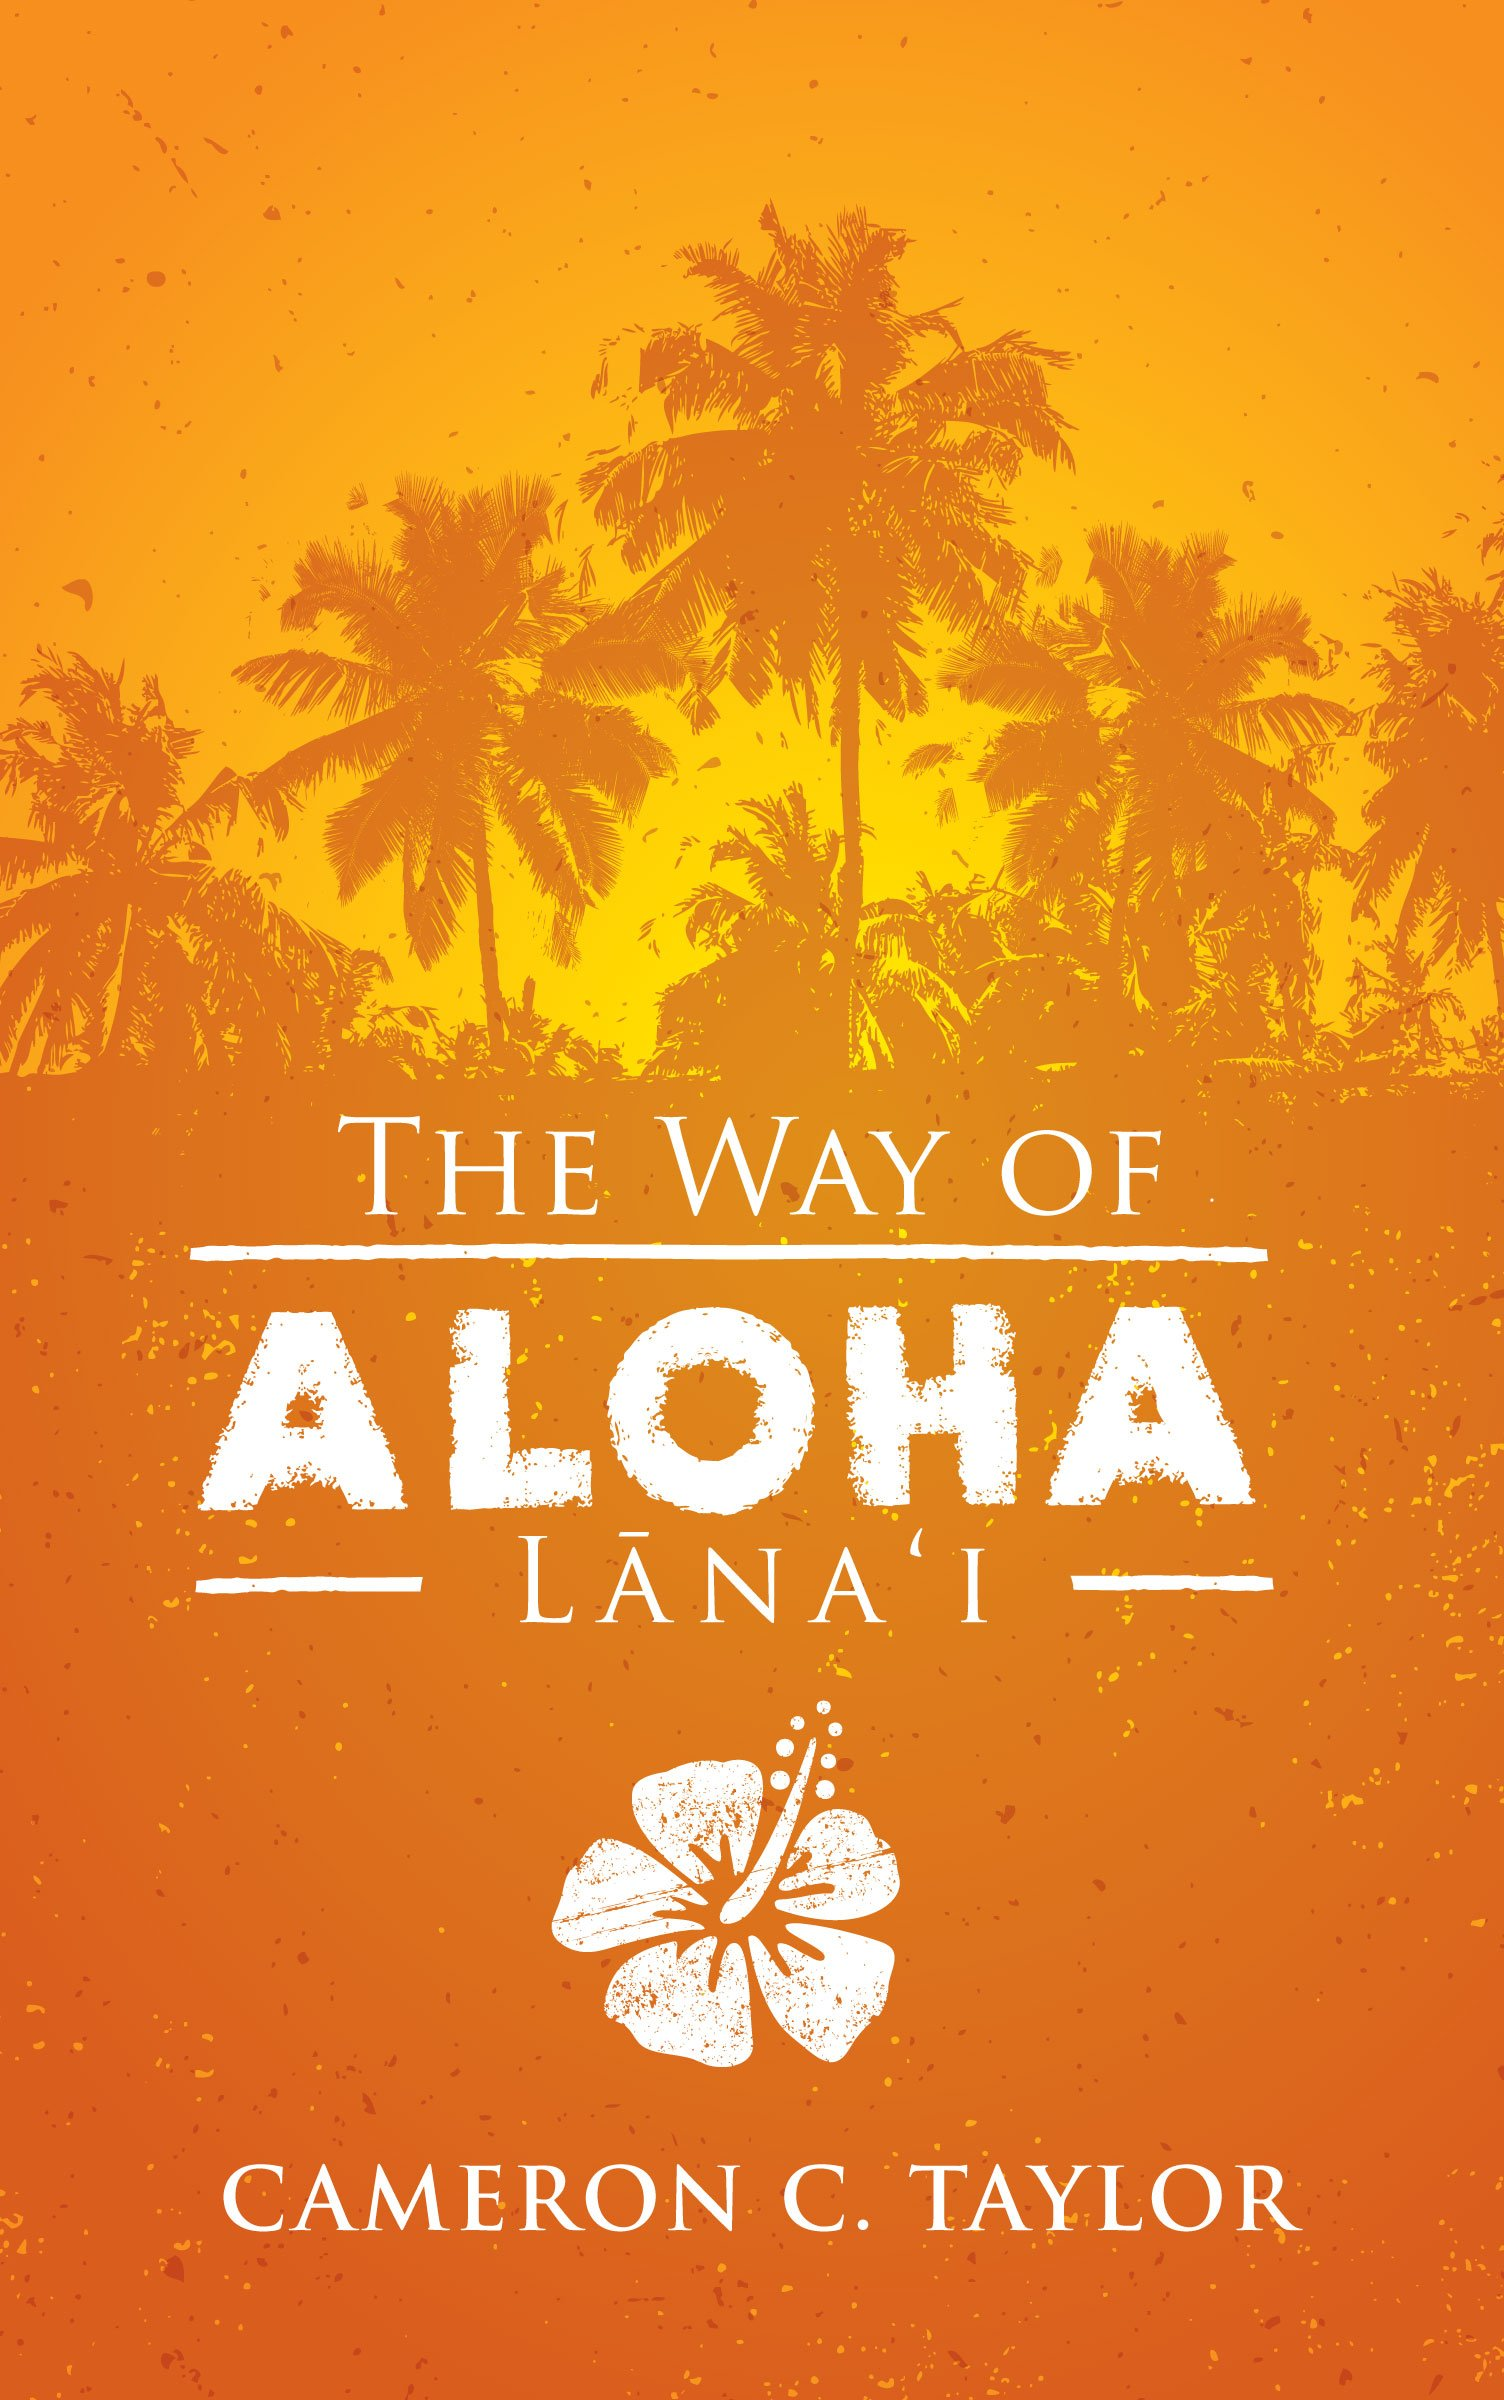 The Way Of Aloha Lanai Cameron C Taylor 9780979686160 Amazoncom